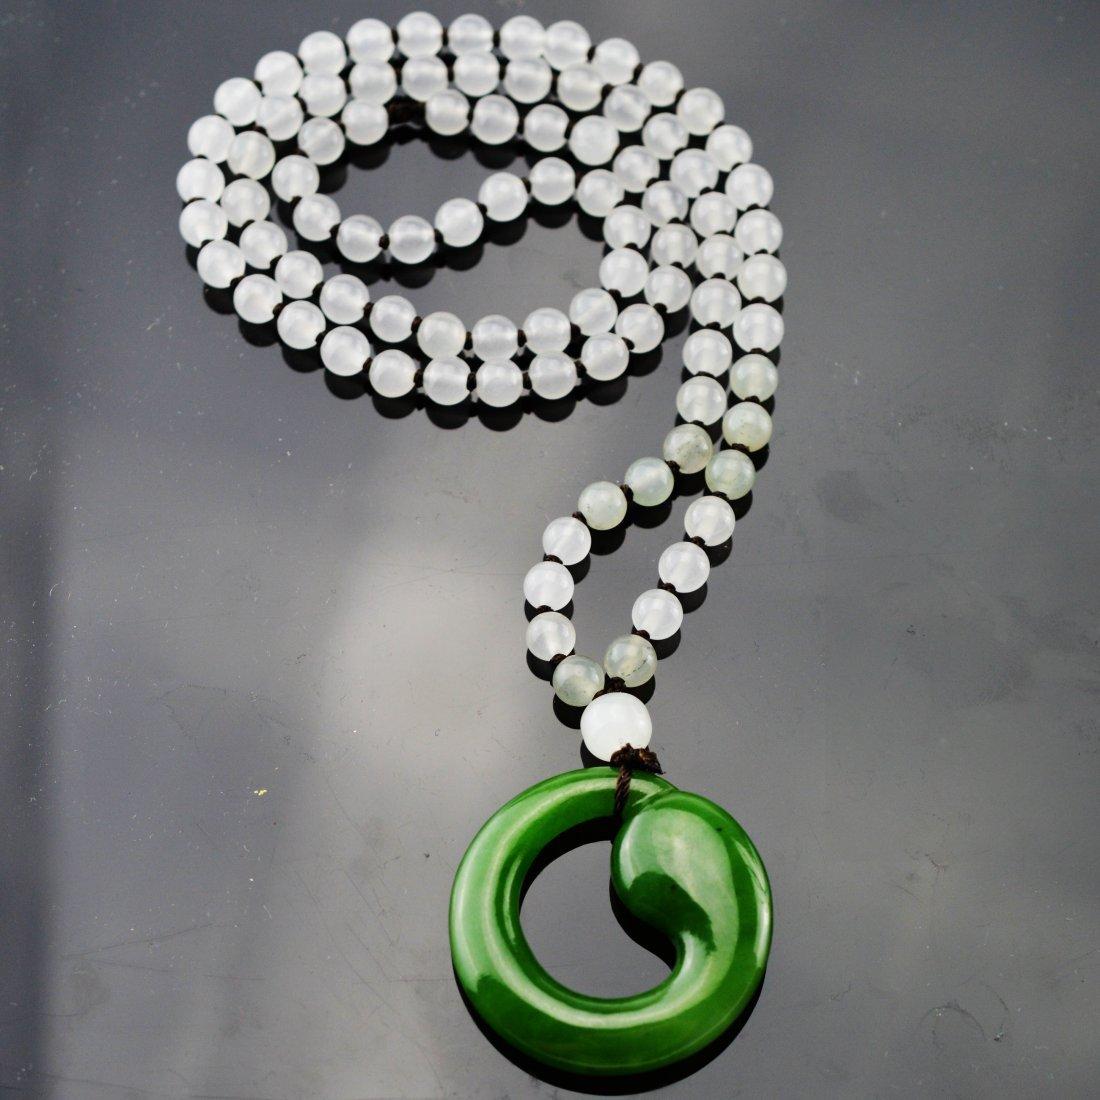 Xin Jiang Green Jade Pendant w/Jade Bead Necklace